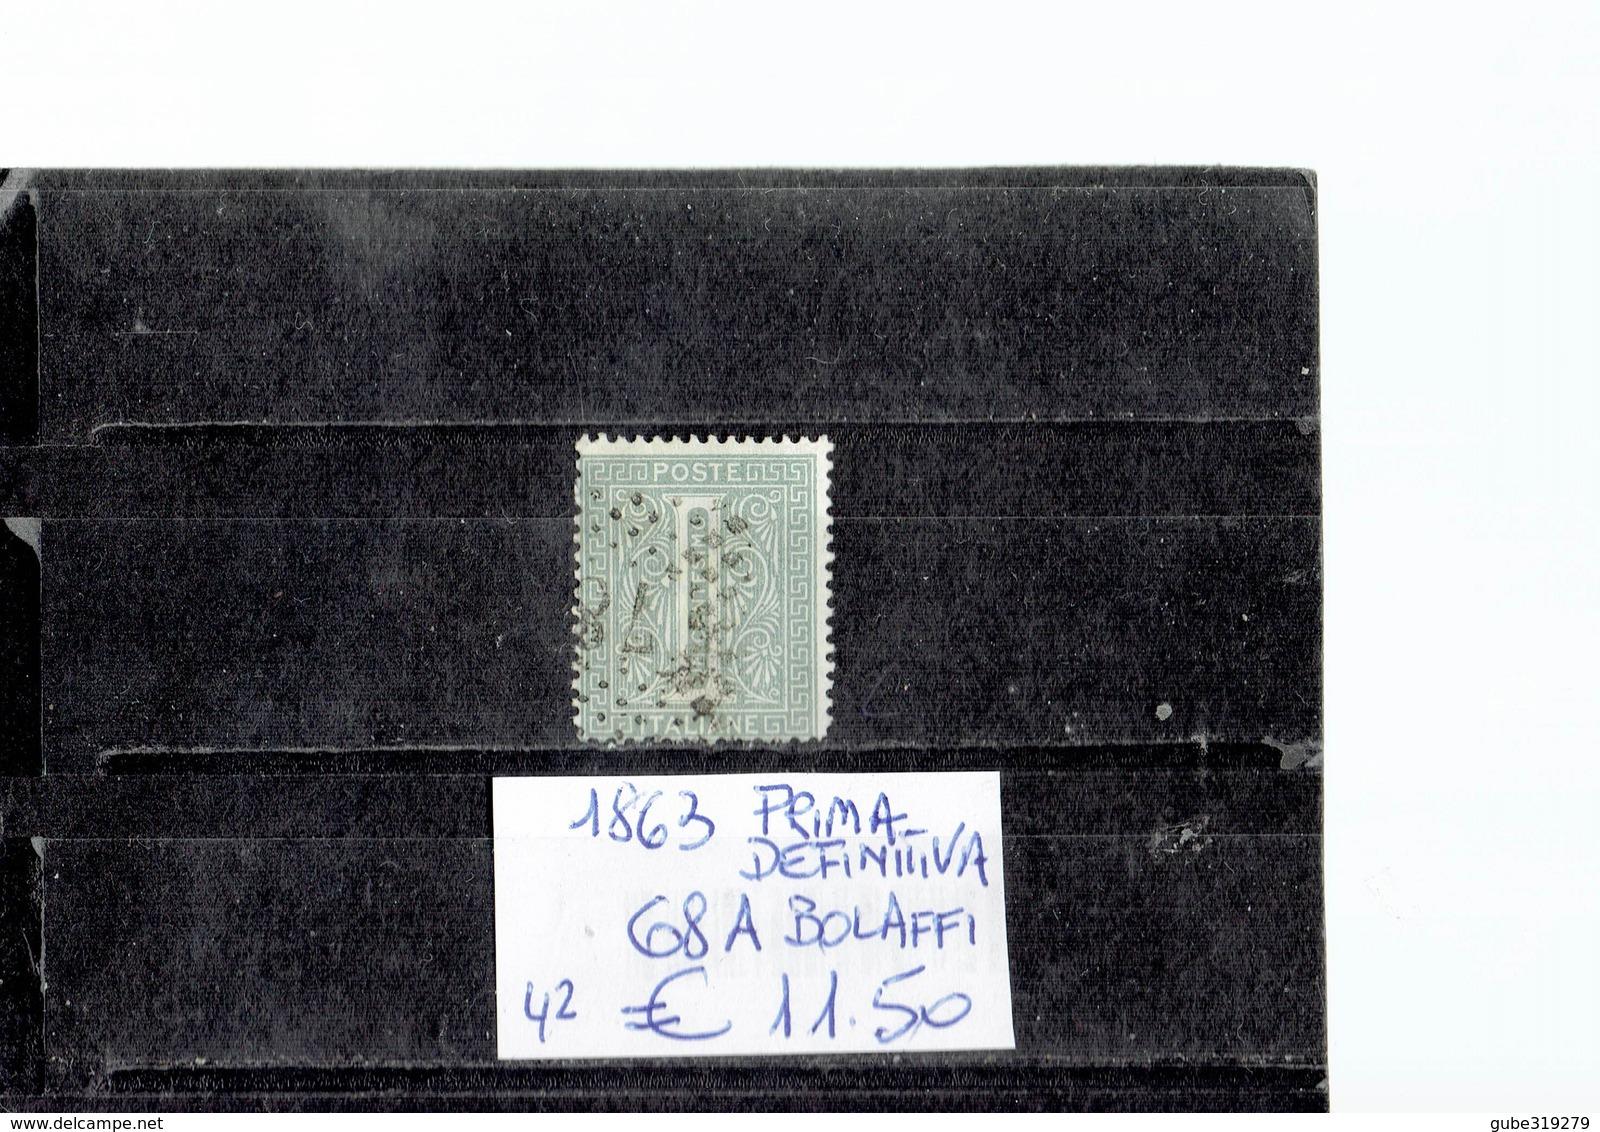 ITALY 1863 - PRIMA SERIE DEFINITIVA 1 CENTESIMO  VERDE USATO (Bolaffi 68A) ALBVEC ITA 1 VER - 1861-78 Vittorio Emanuele II